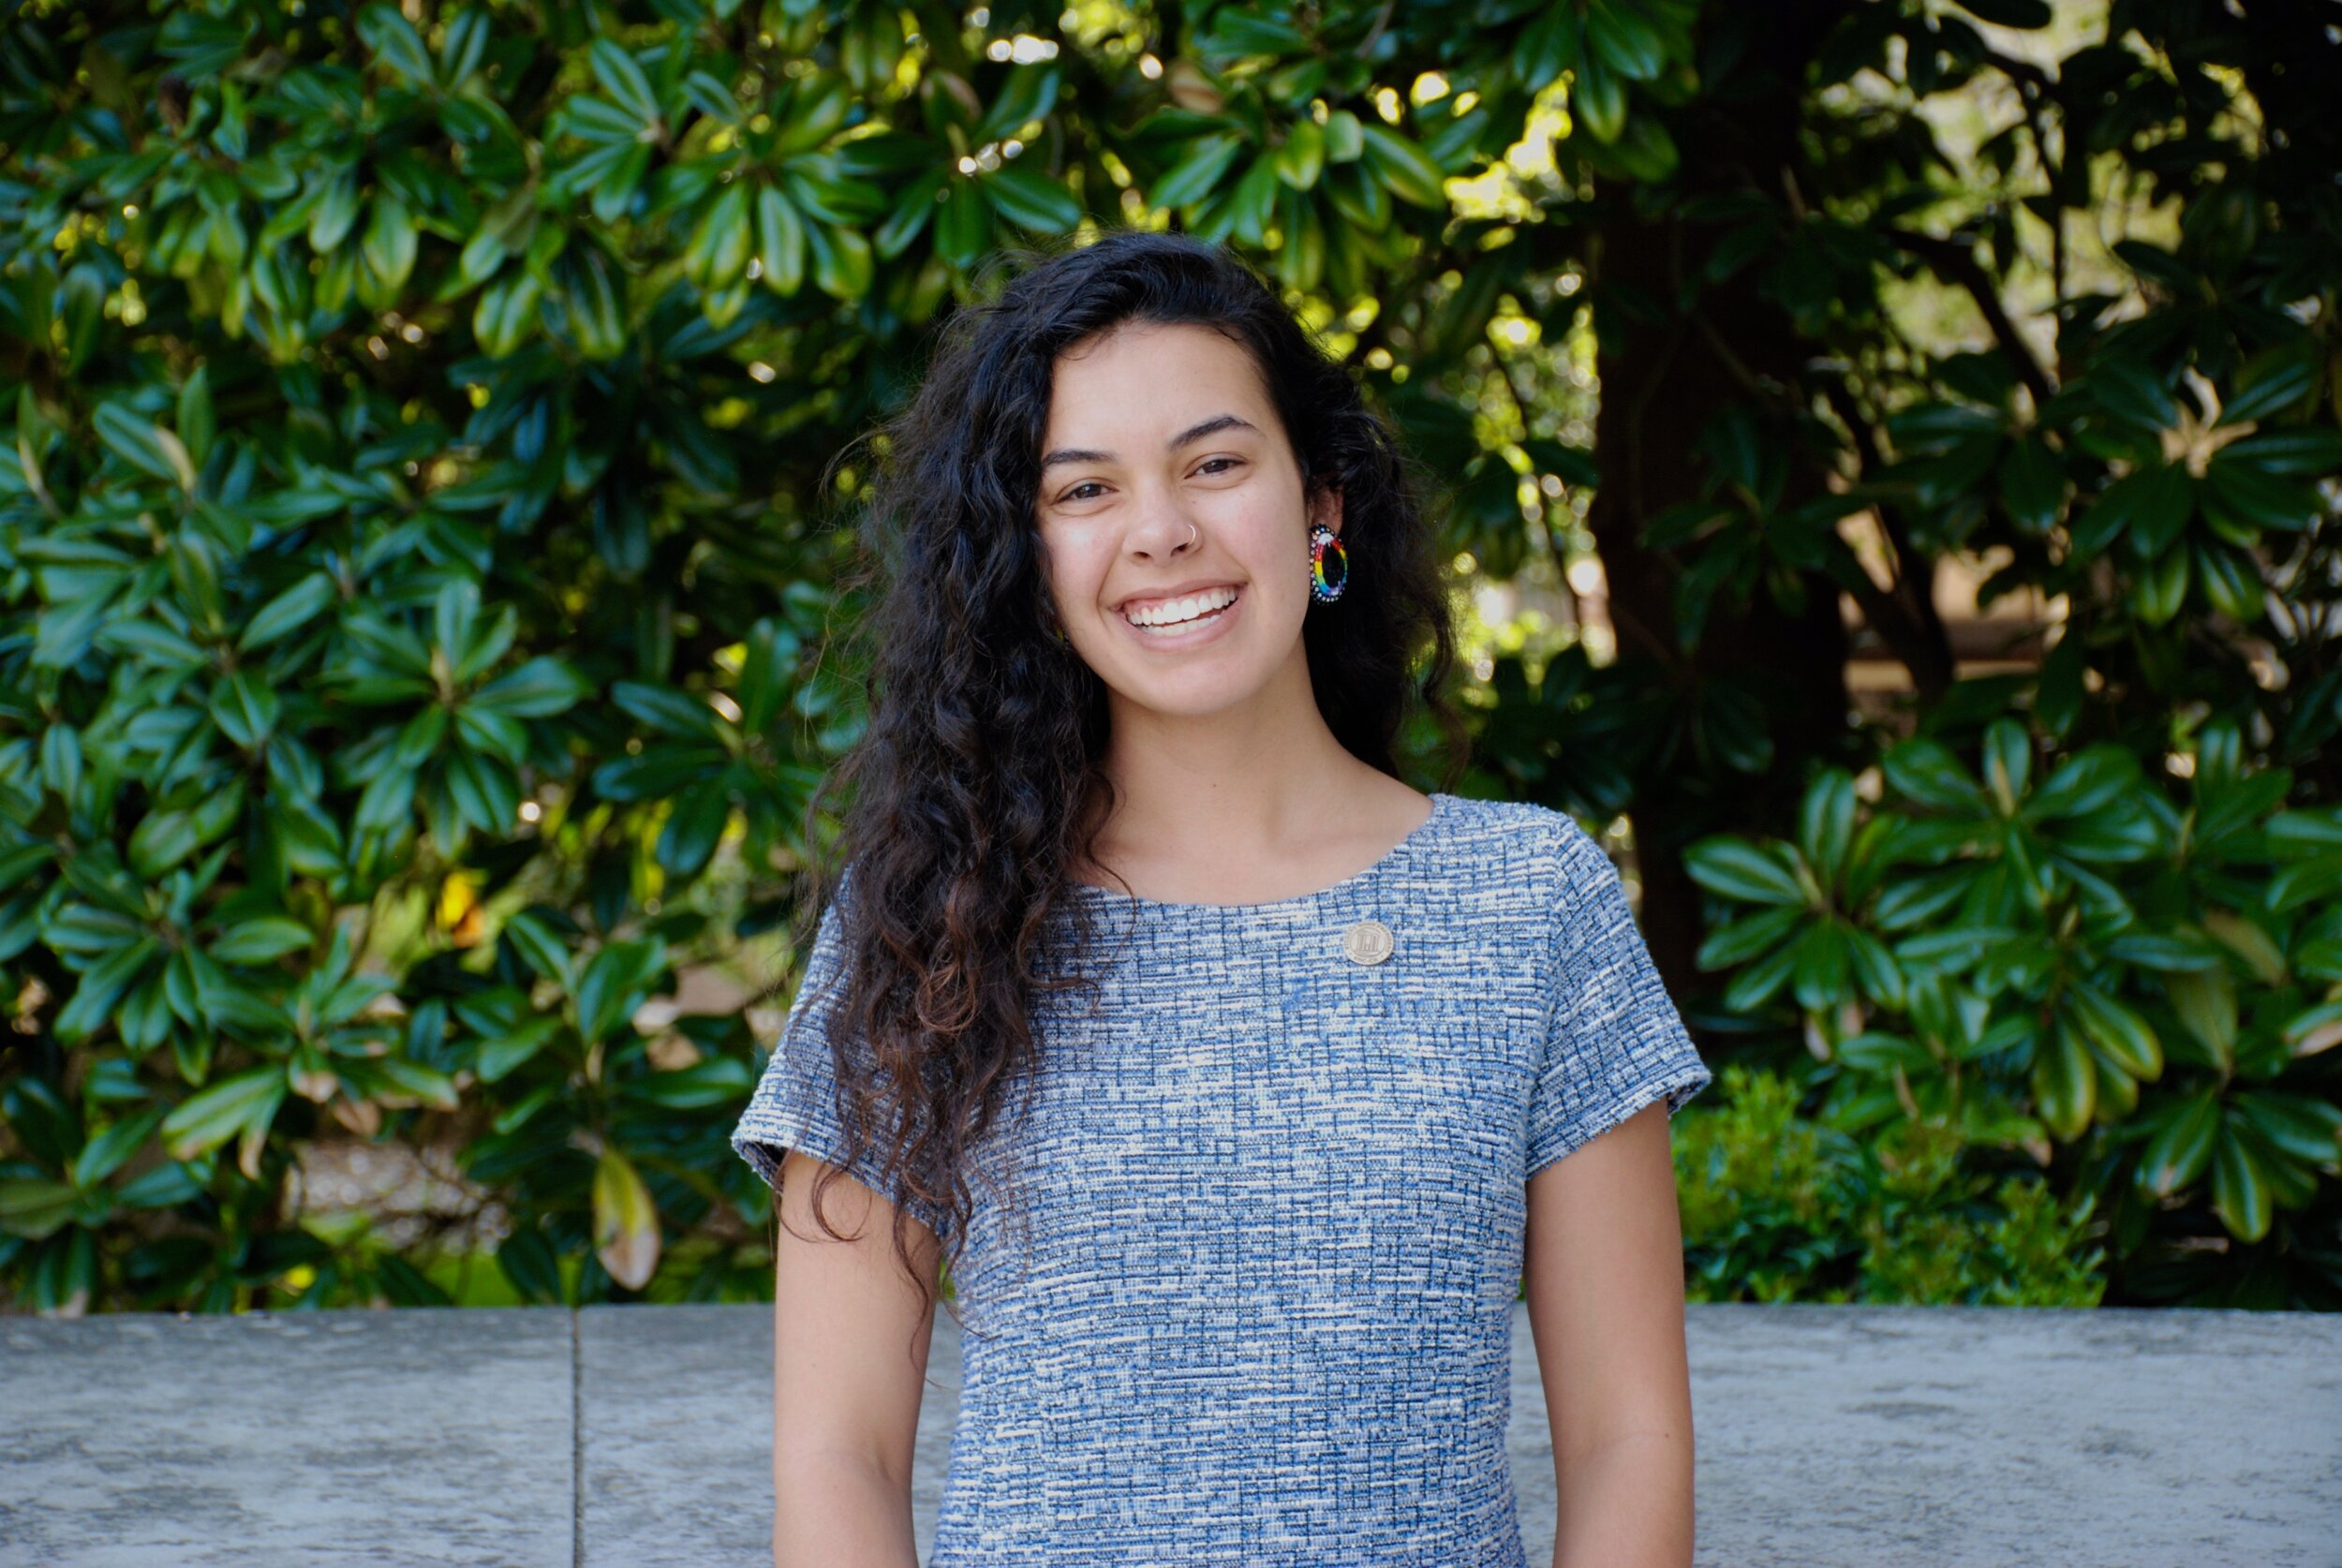 The 2019-2020 UNC Student Body President, Ashton Martin